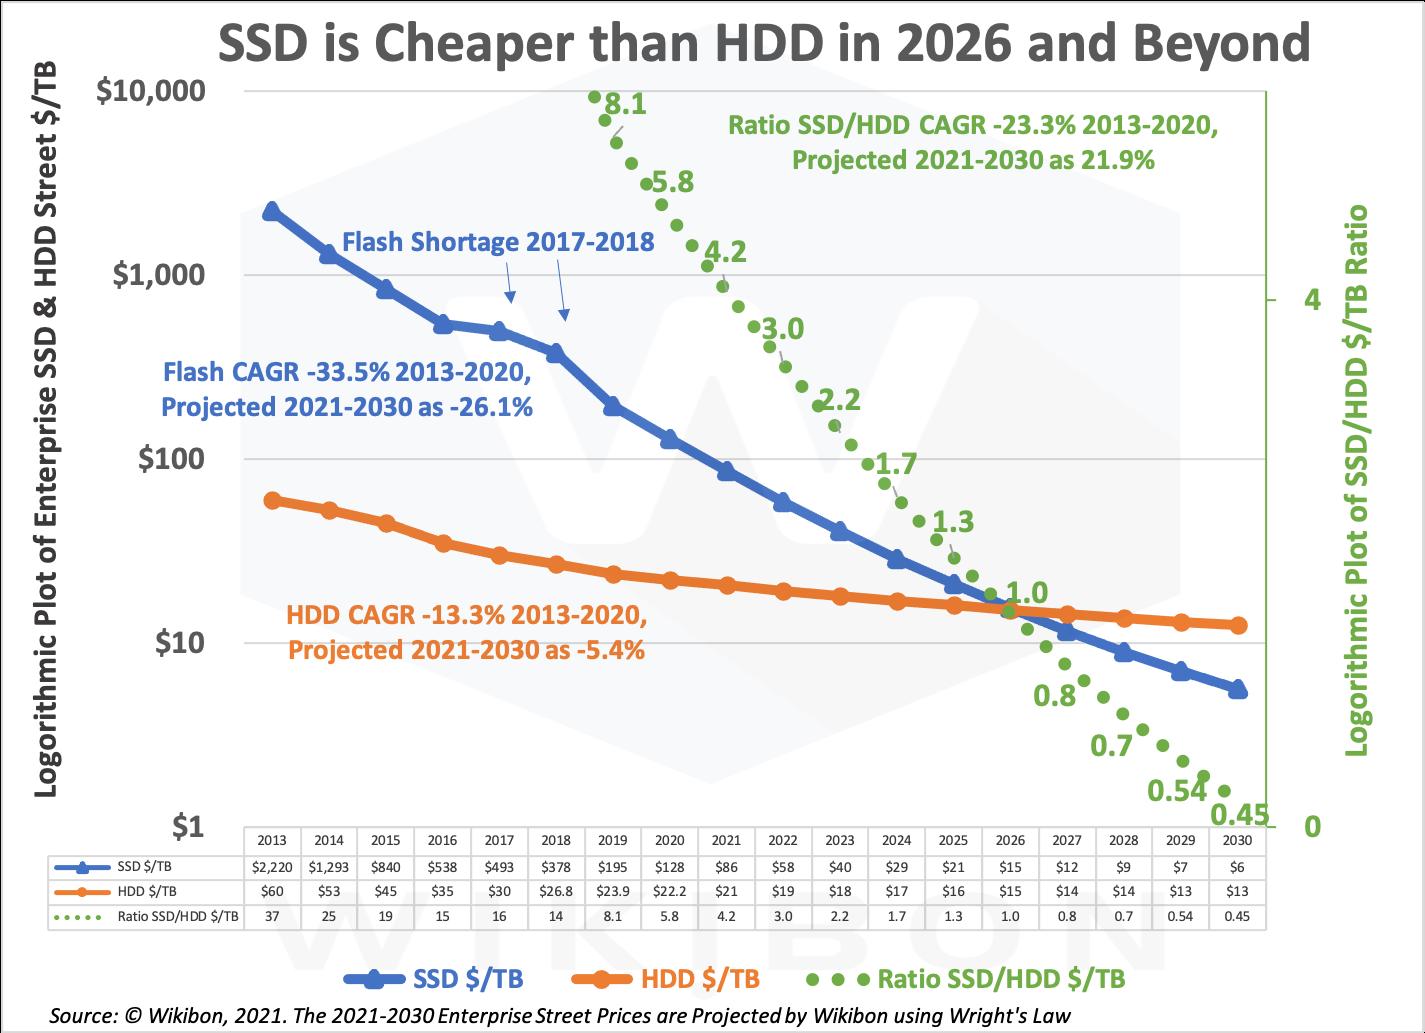 Preisentwicklung HDD vs. SSD